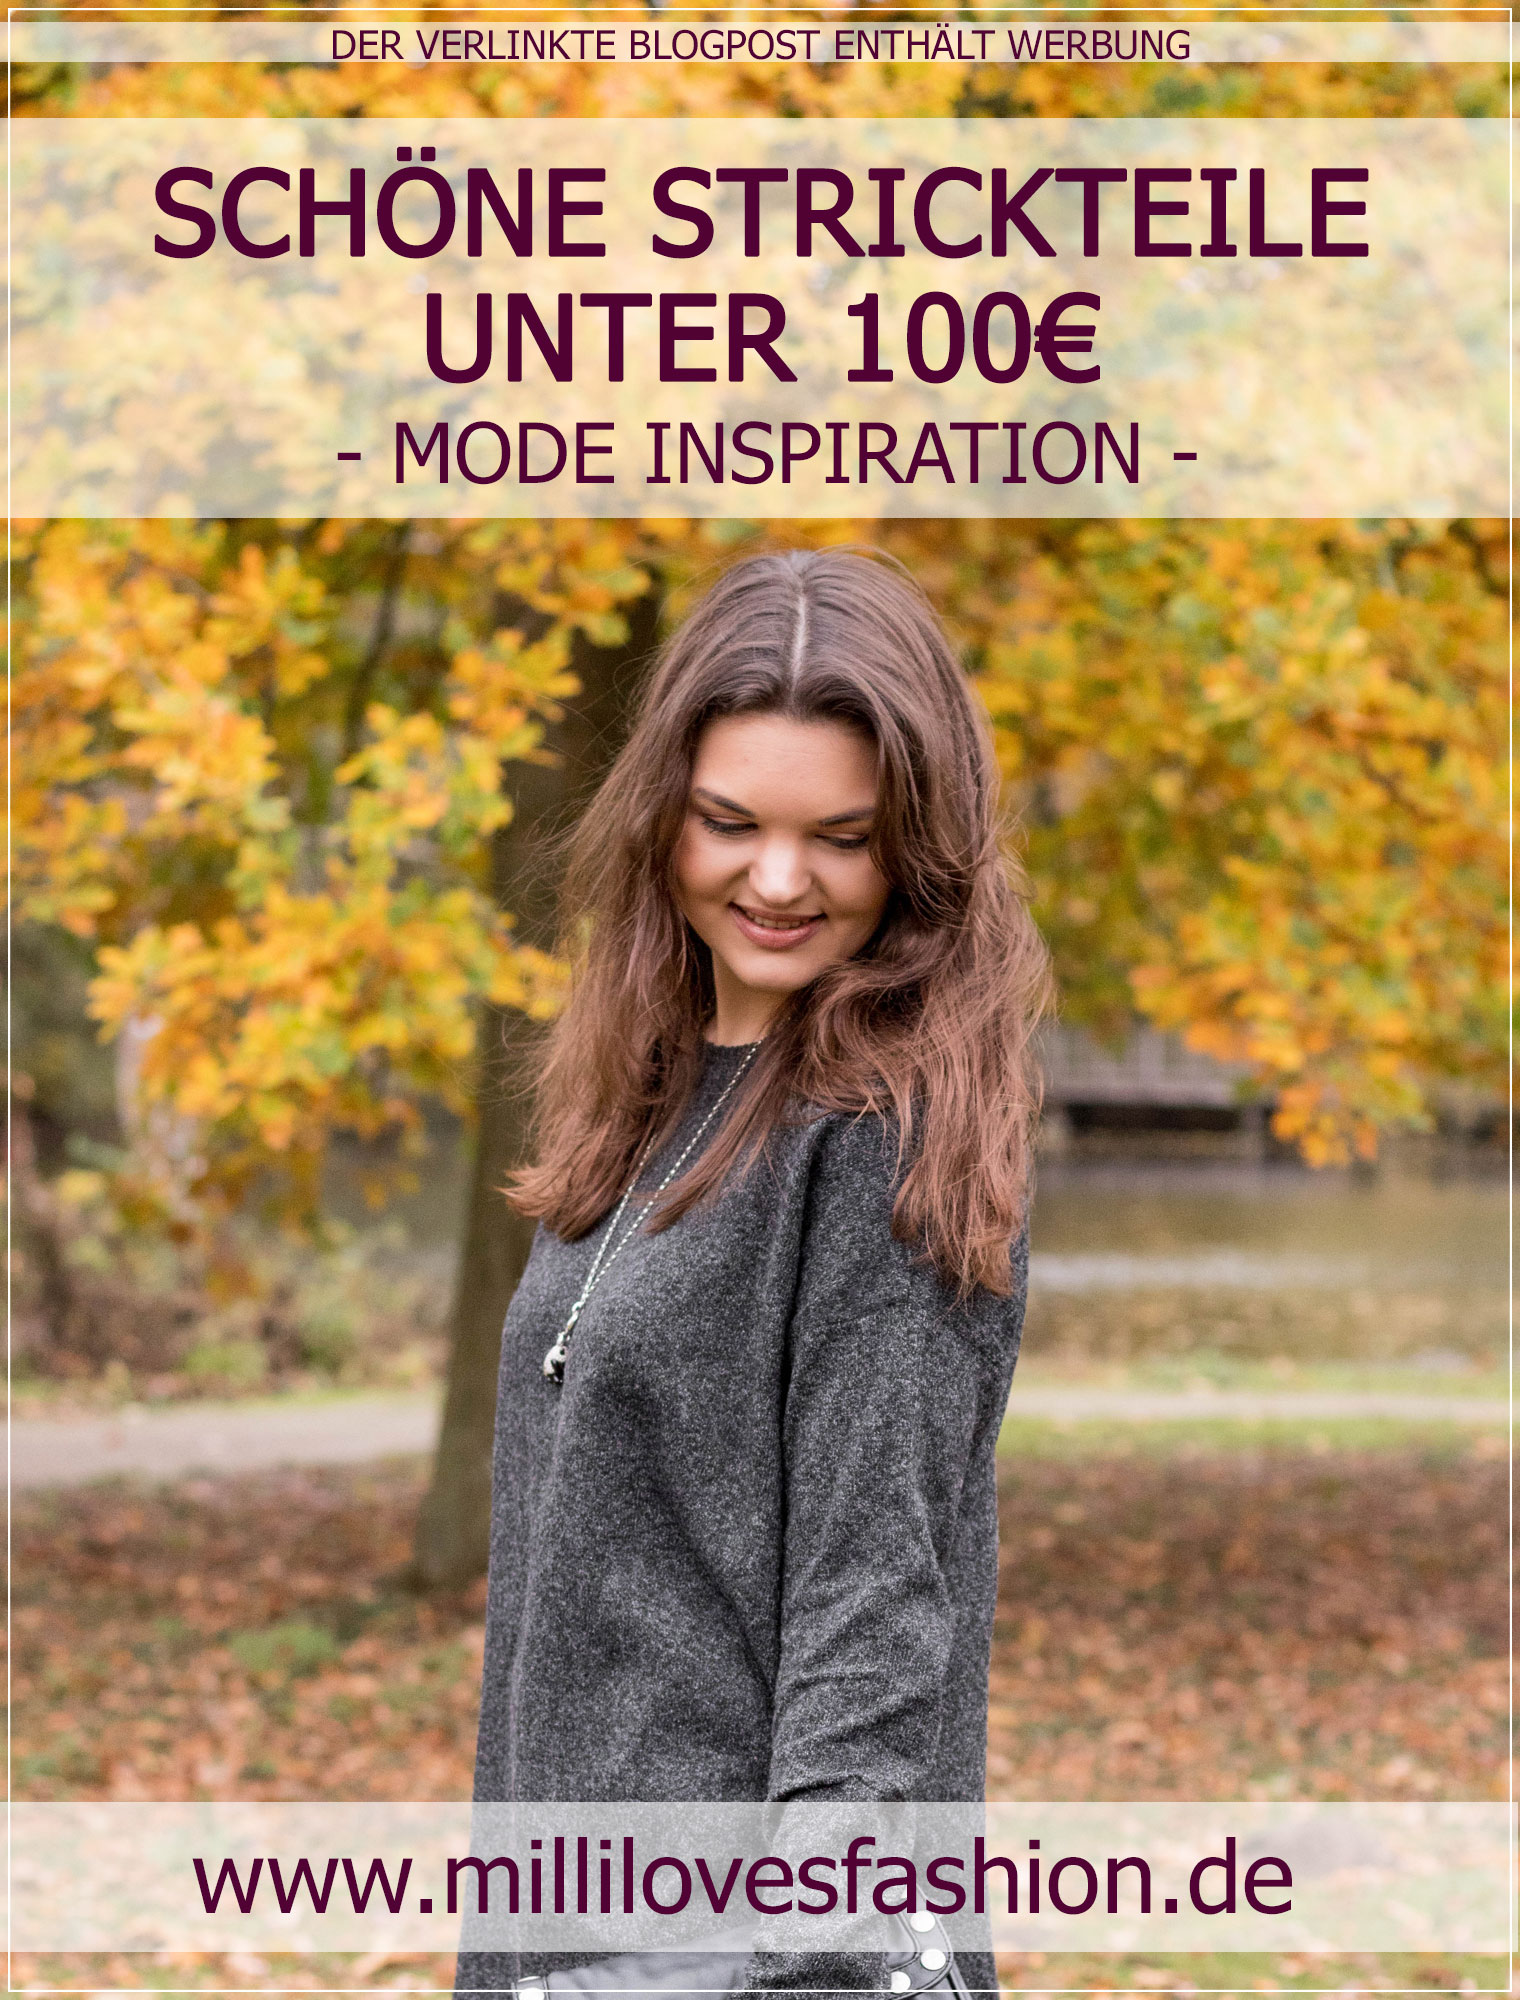 Strickpullover, Strickcardigans, Strickteile unter 100, Shopping Inspiration, Herbstmode, Modetrends, Fashion, Modeblog, Ruhrgebiet, Herbstmode, Bloggerin, Fashionblog